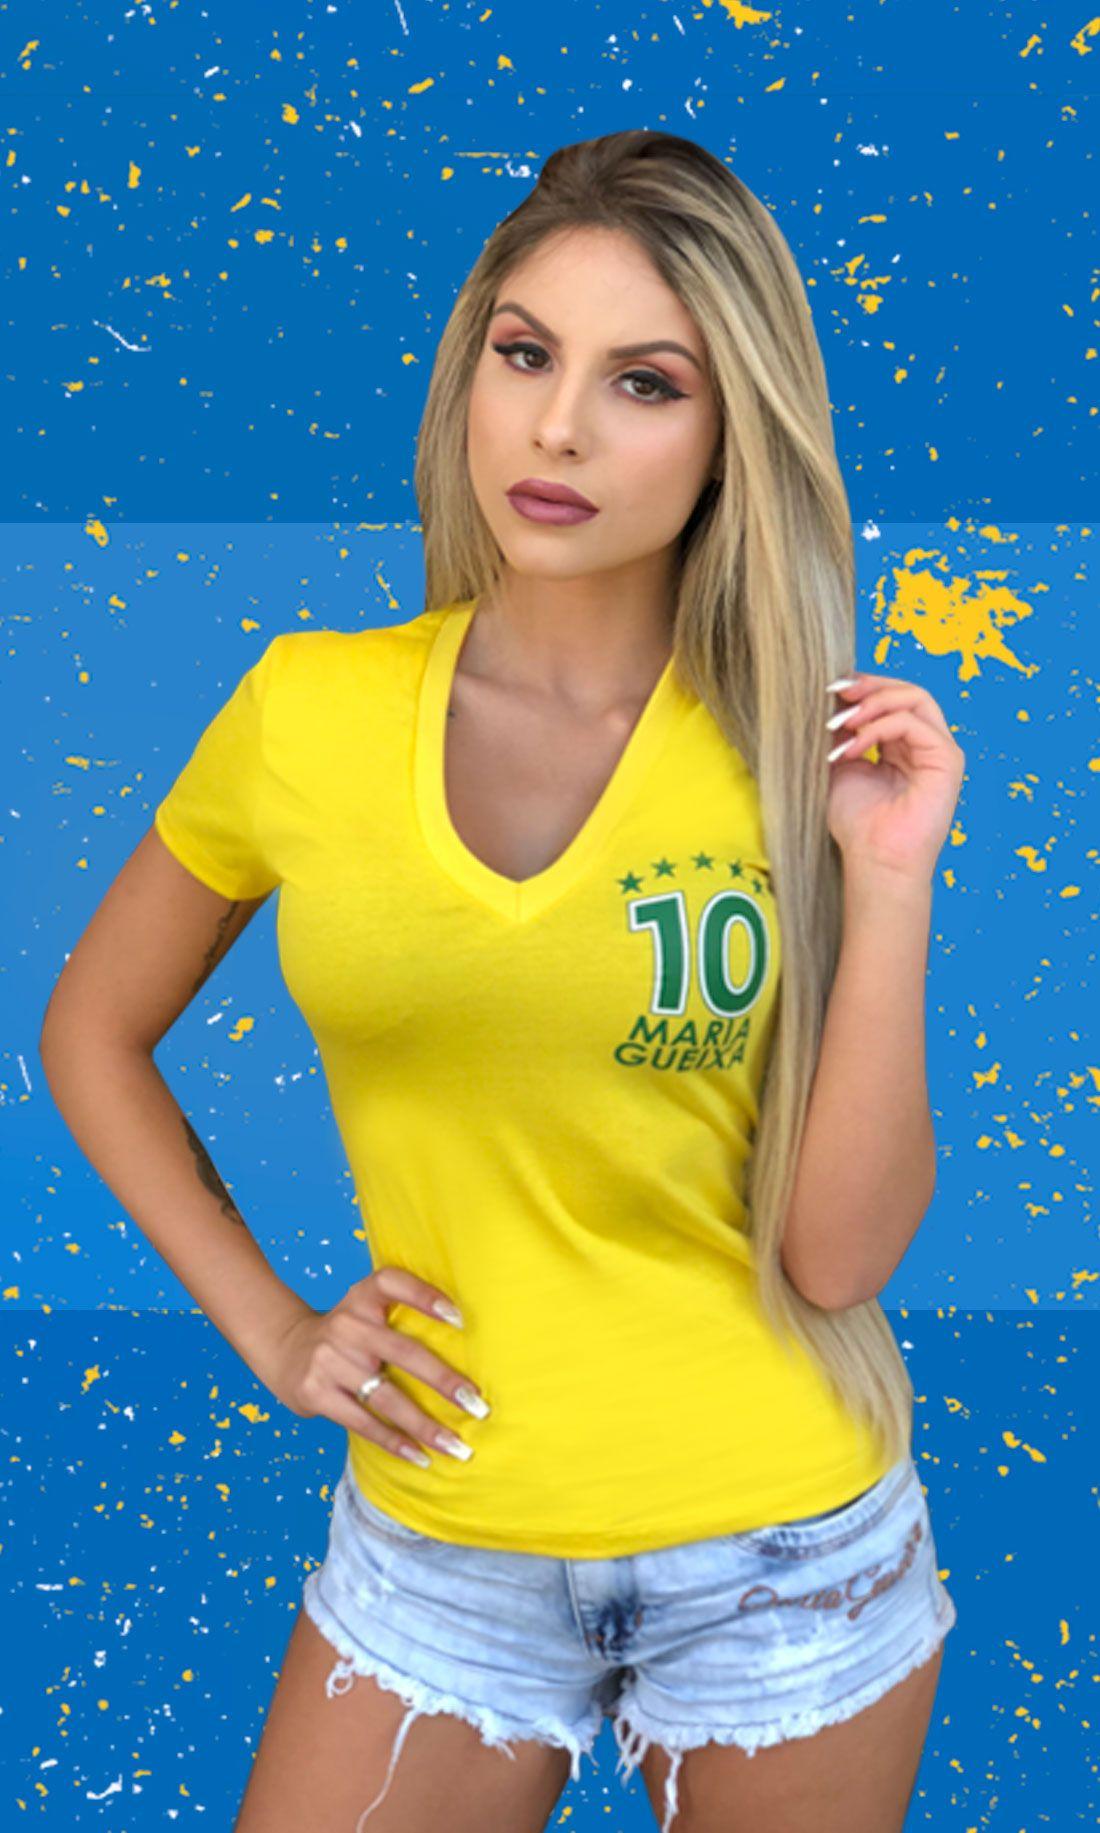 BLUSA T-SHIRT BRASIL 10 MARIA GUEIXA AMARELO